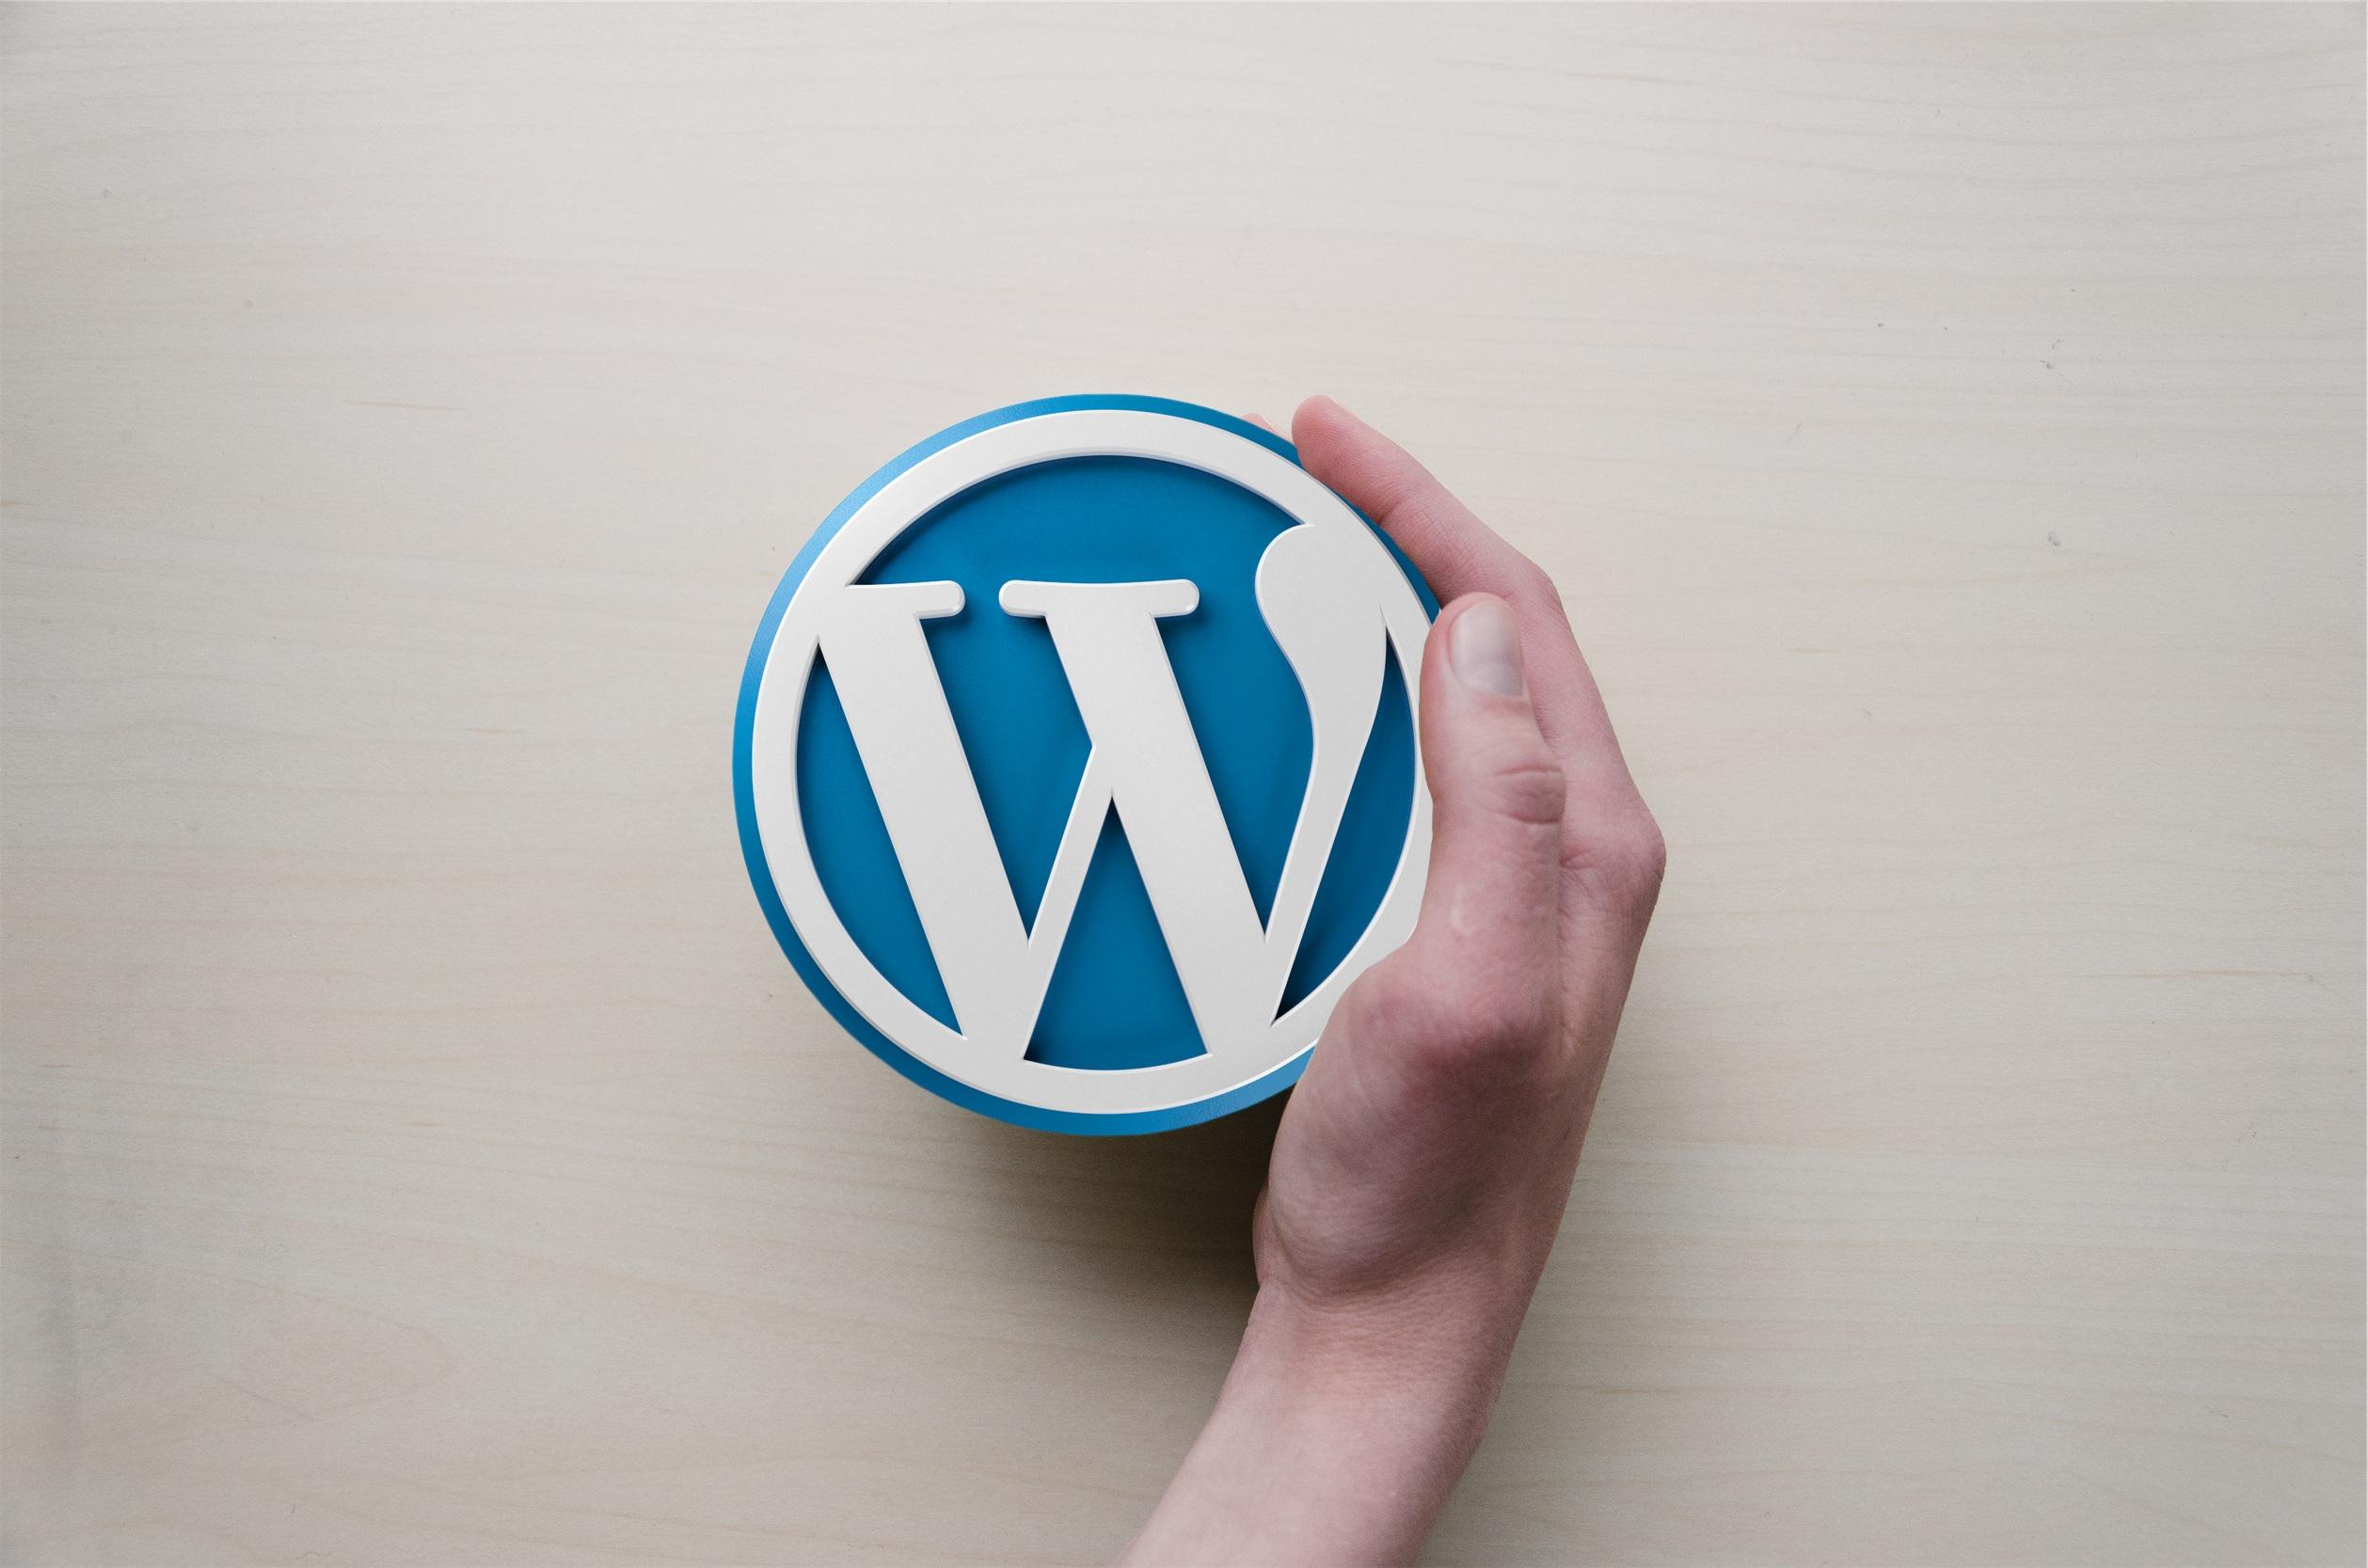 Free Images : hand, number, symbol, blue, circle, blogging ...